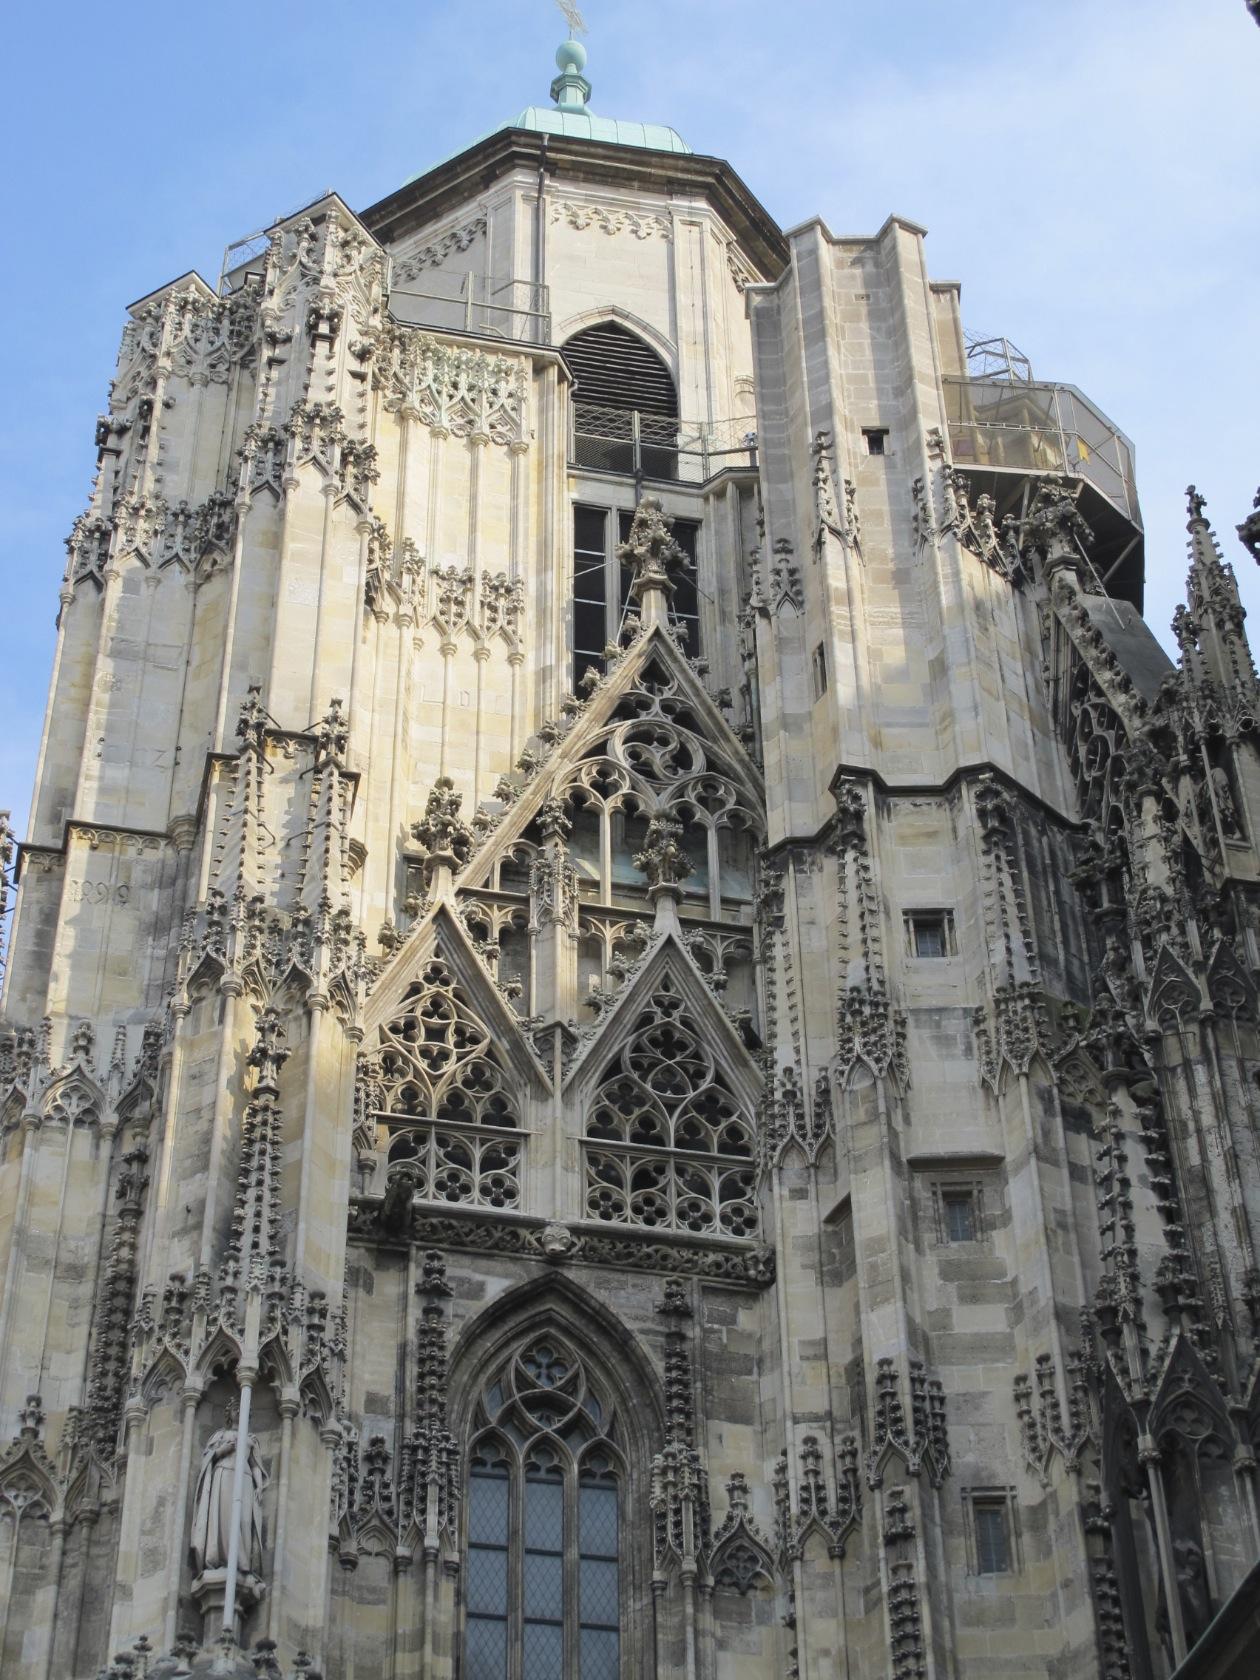 St. Stephen's exterior